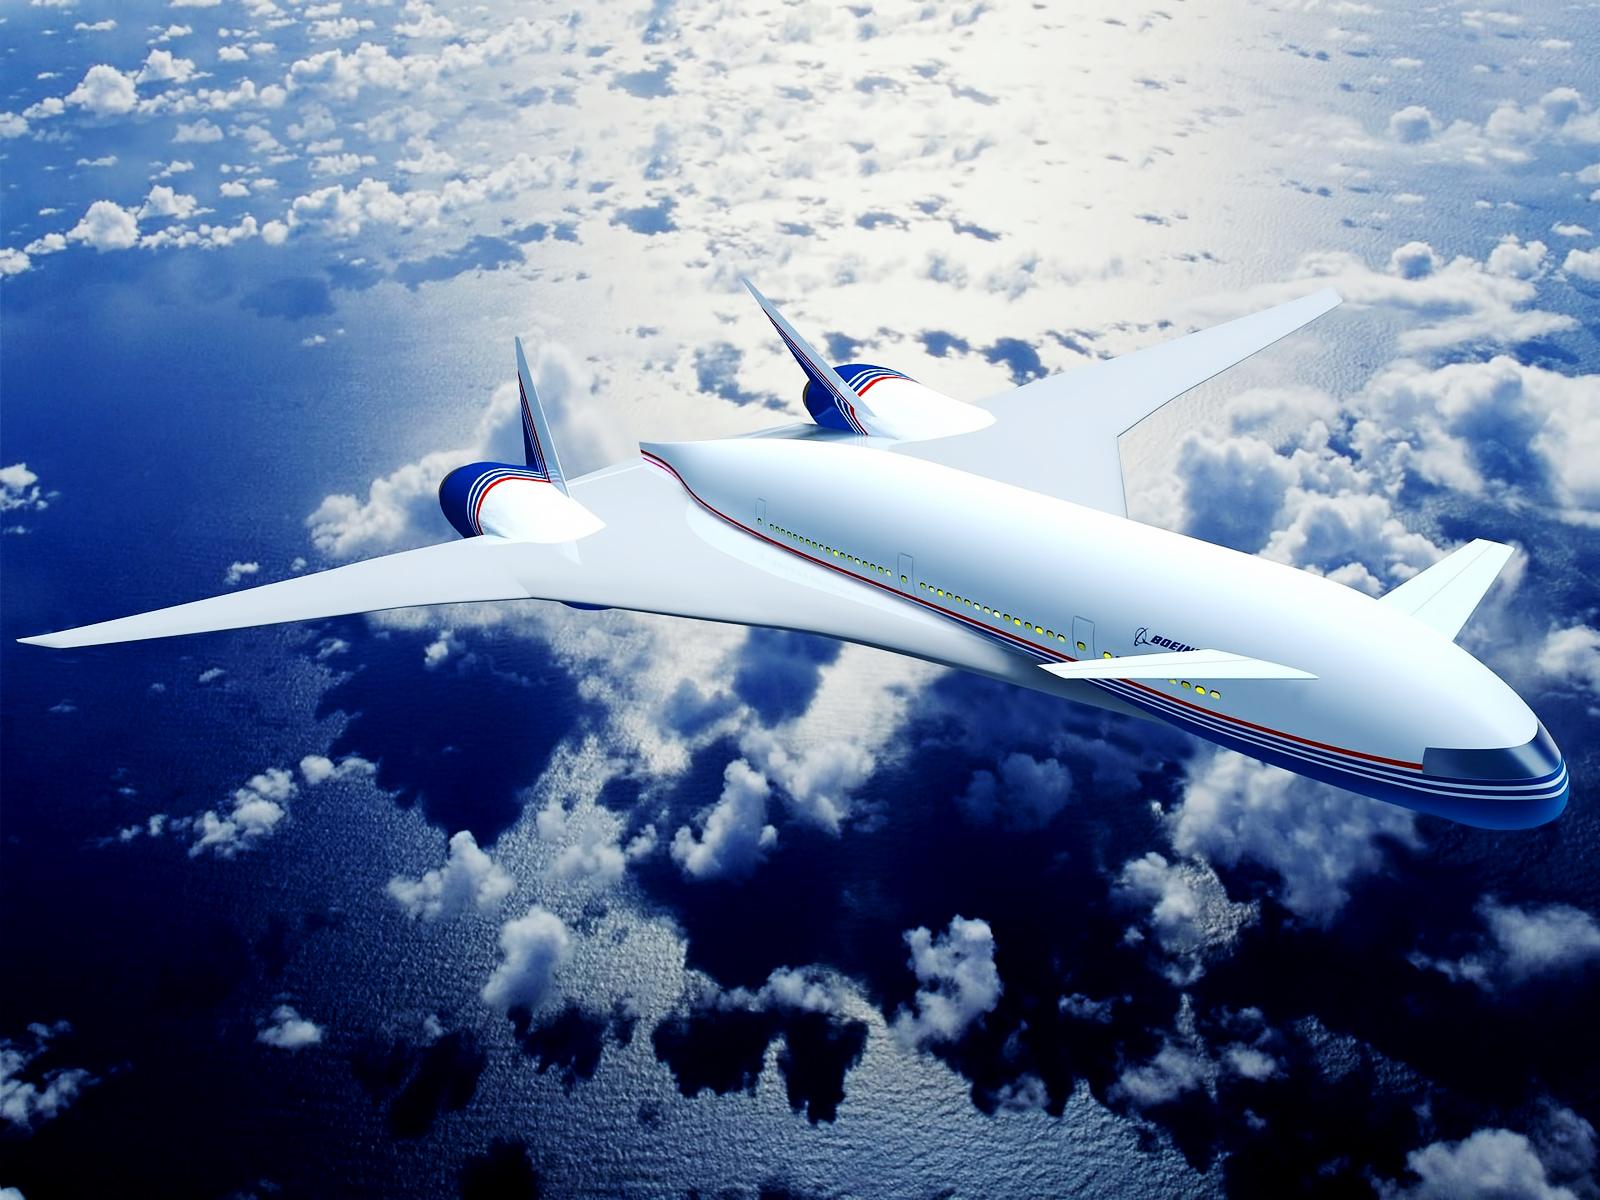 Boeing 747 planes sky clouds hd wallpaper desktop wallpapers - Boeing wallpapers for desktop ...